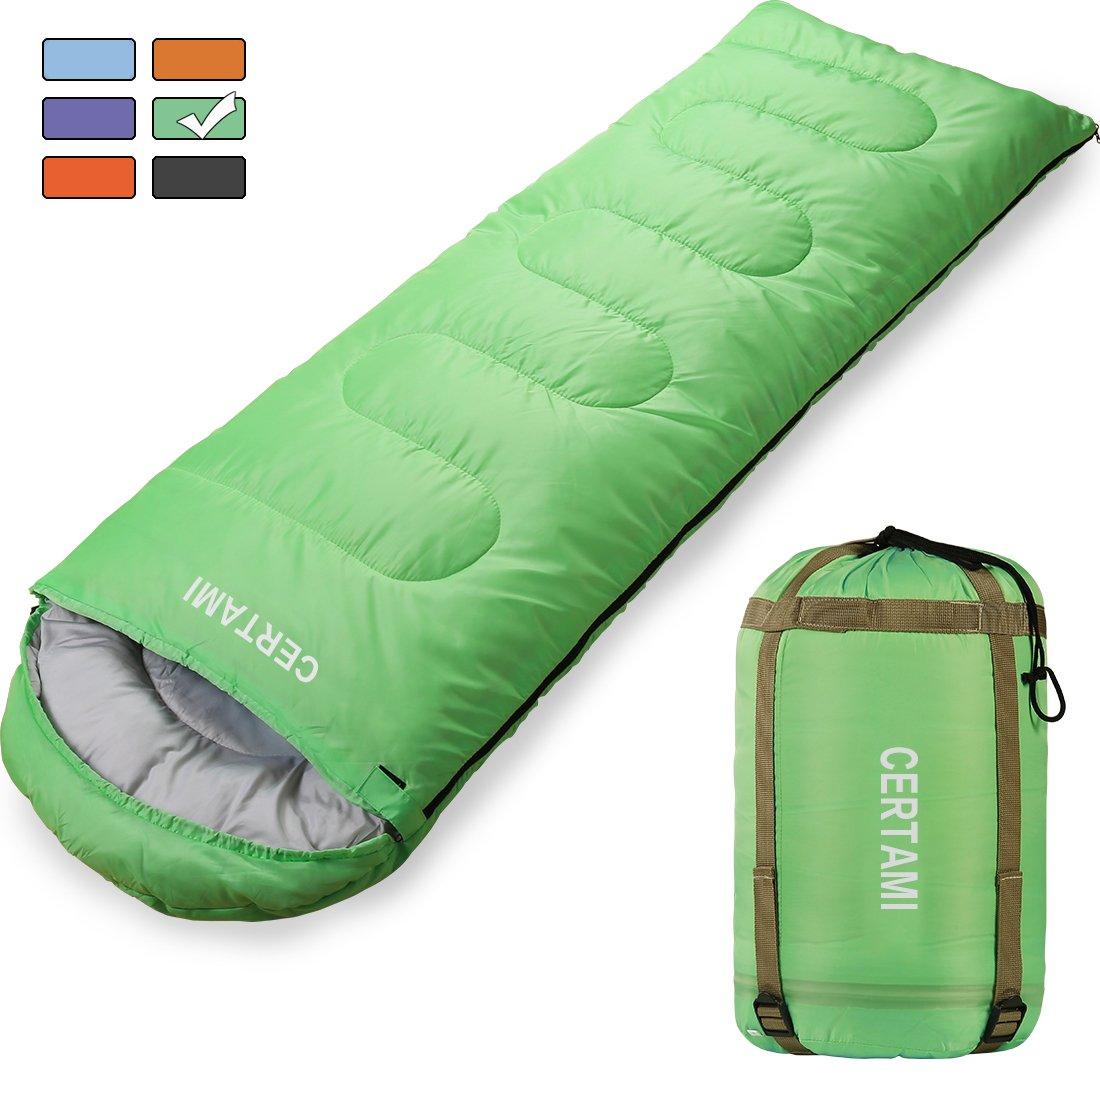 certami Sleeping Bag – 封筒軽量ポータブル防水性、大人用3シーズンアウトドアキャンプハイキング。 B0799FZQKN Green / Right Zip Green / Right Zip